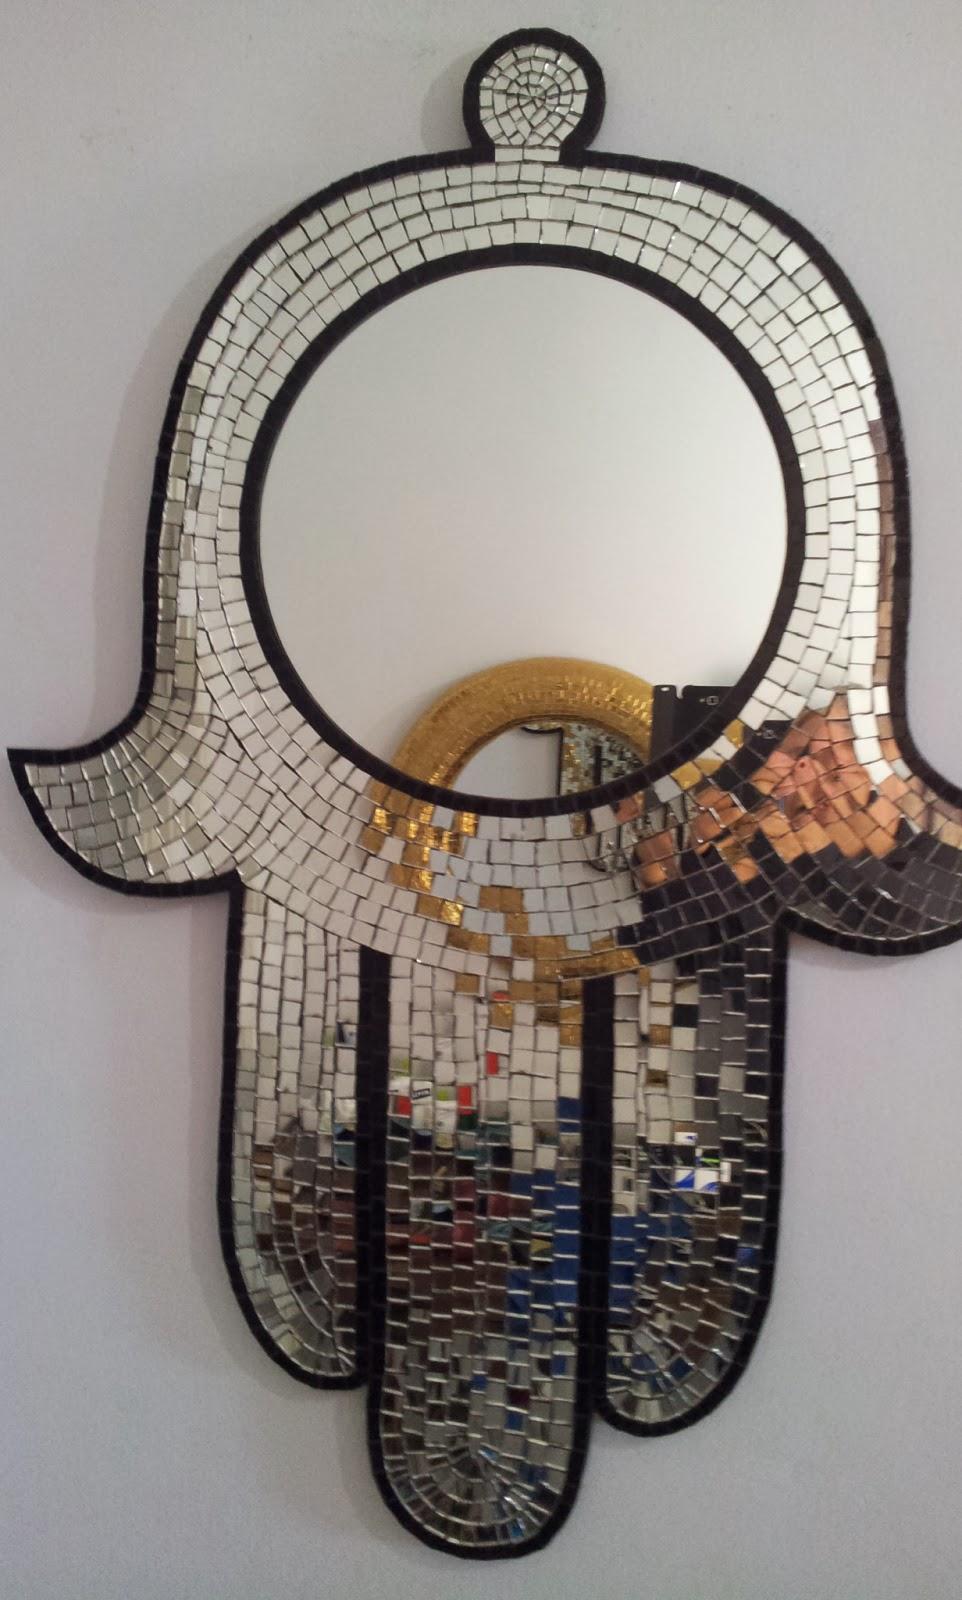 Mozaliza claude feghali mosaiste miroirs mosaique for Miroir mosaique